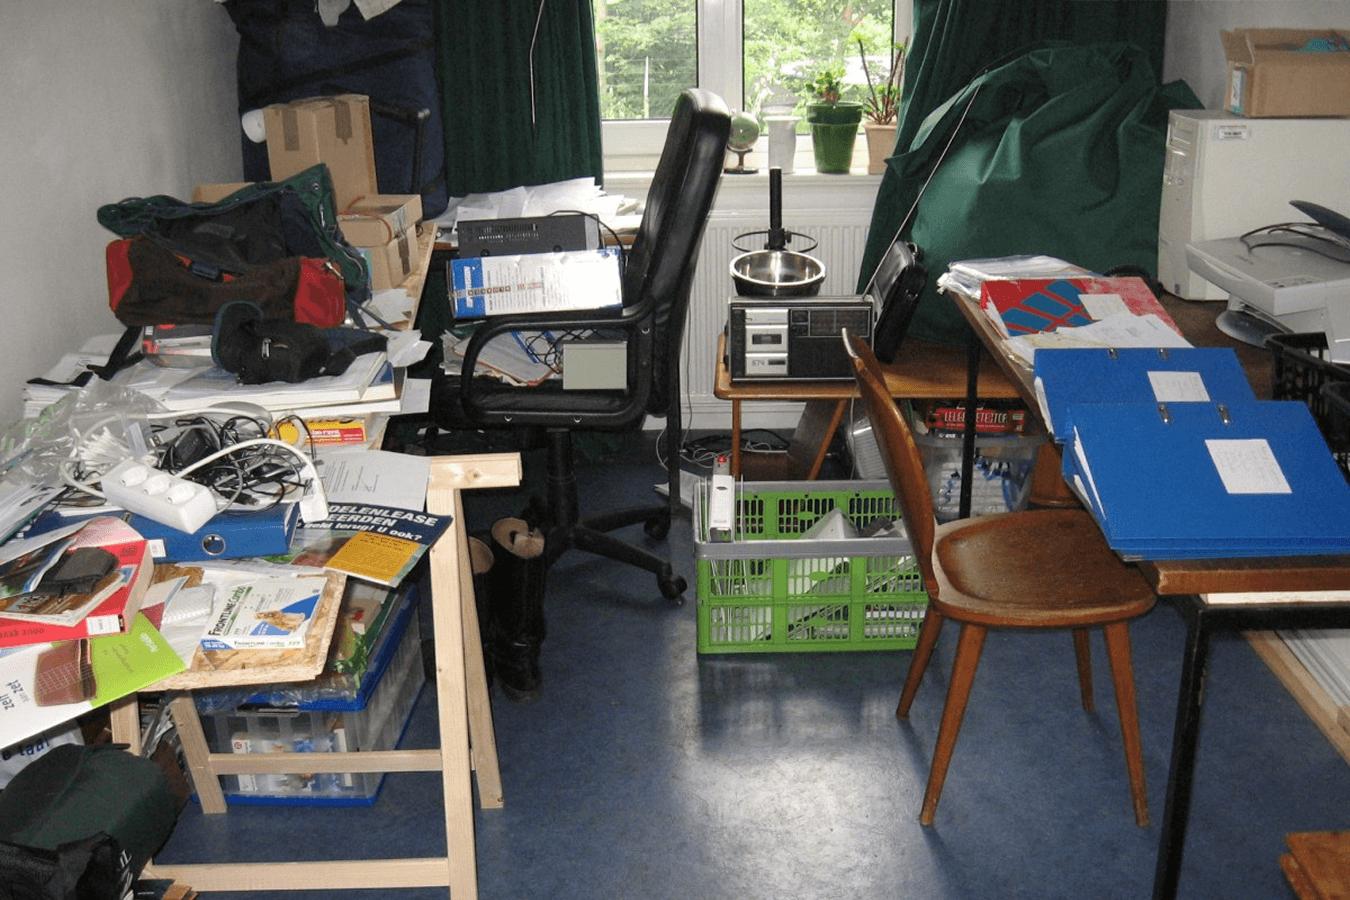 workshop, living room, clutter, chaos